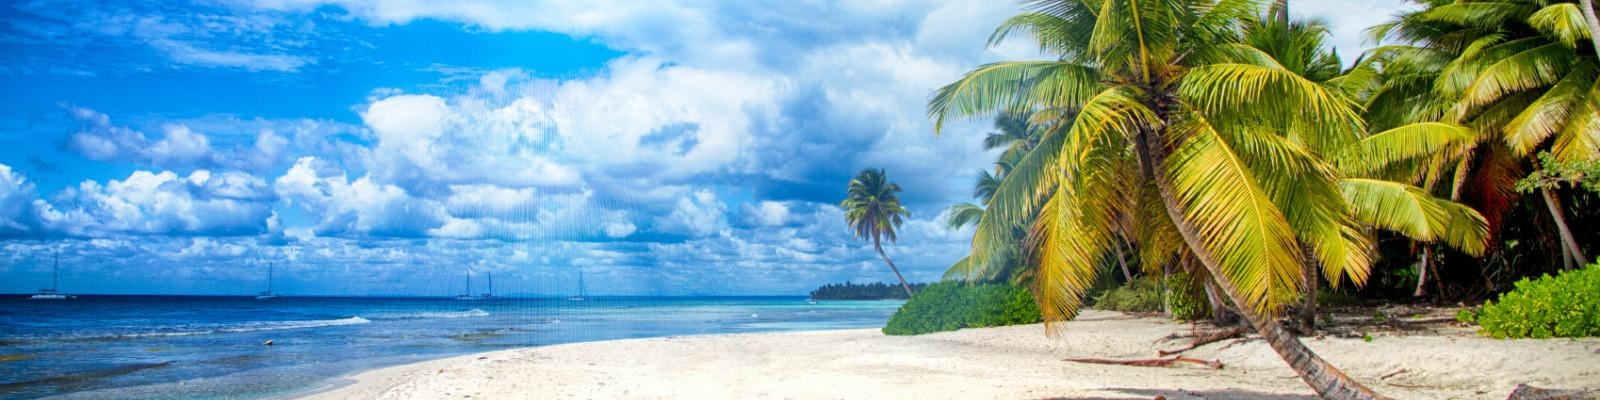 Individuelle Mittelamerika-Reisen & Mittelamerika-Urlaub